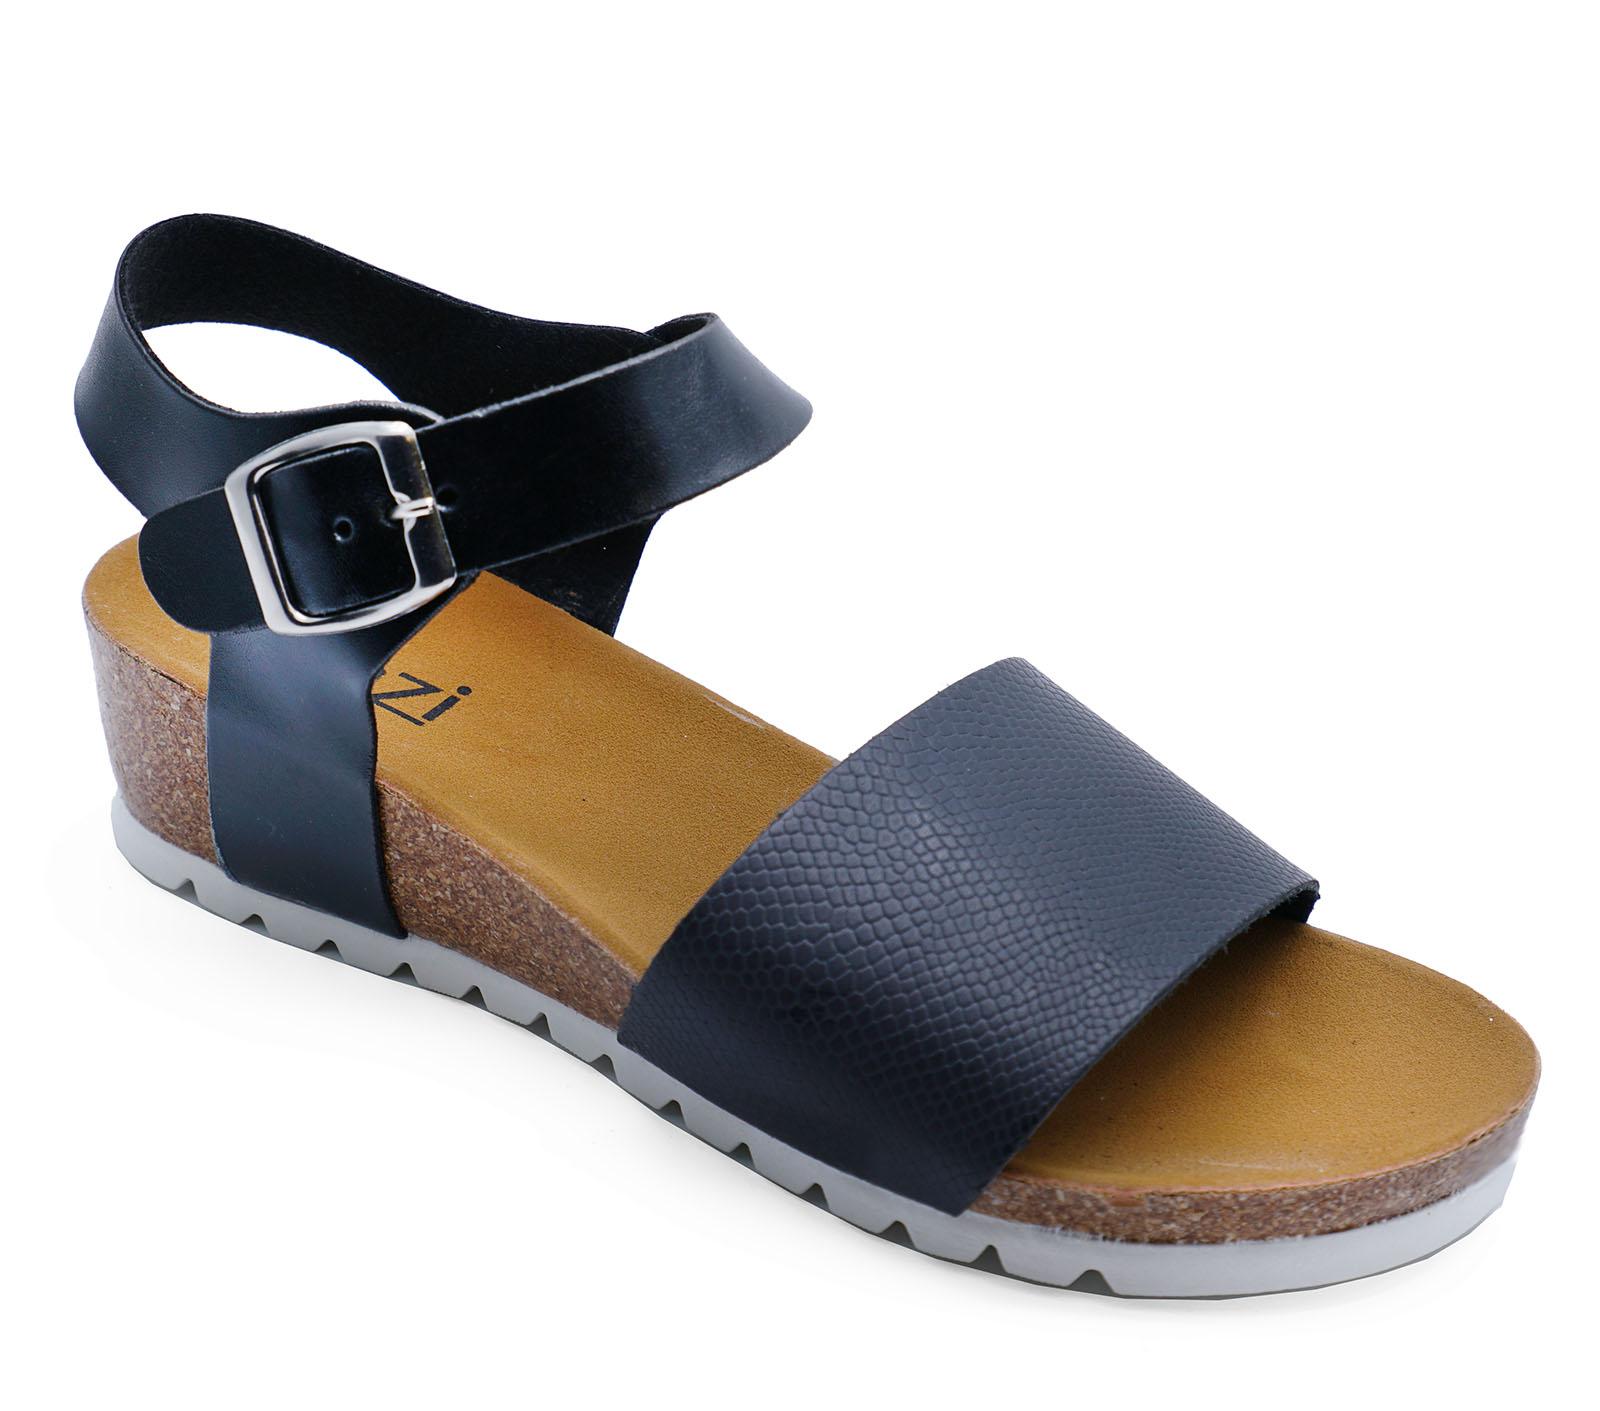 3 Black toe Walking Holiday Sandals Open Flip Shoes Summer Wedges flop Ladies 8 f6aPxwqP